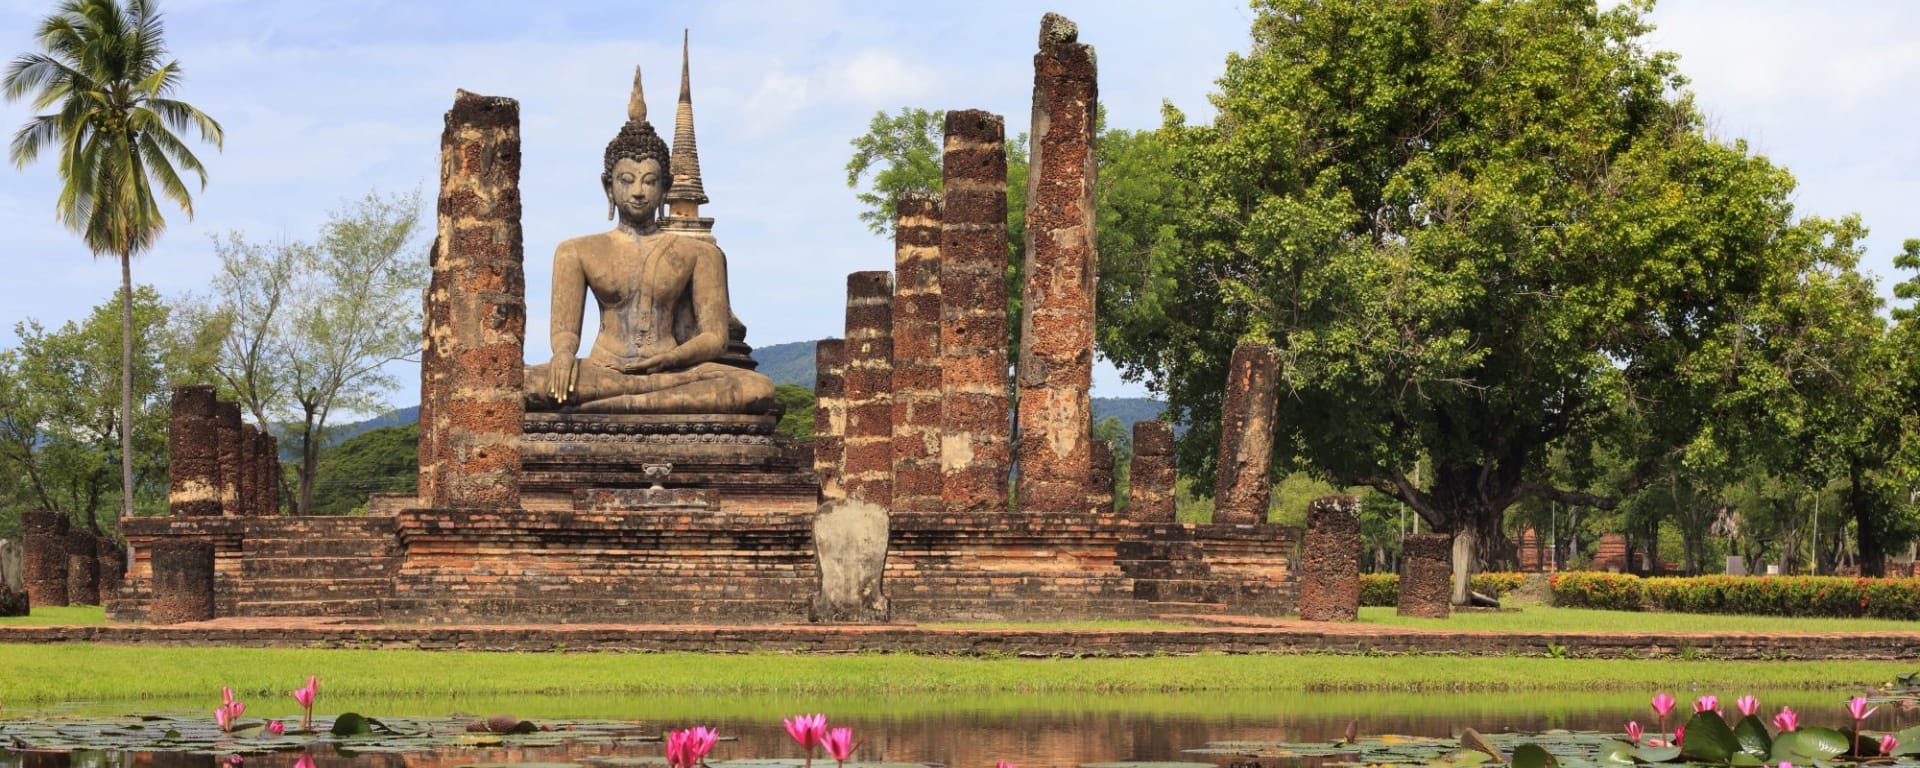 Thaïlande compacte de Bangkok: Sukhothai: